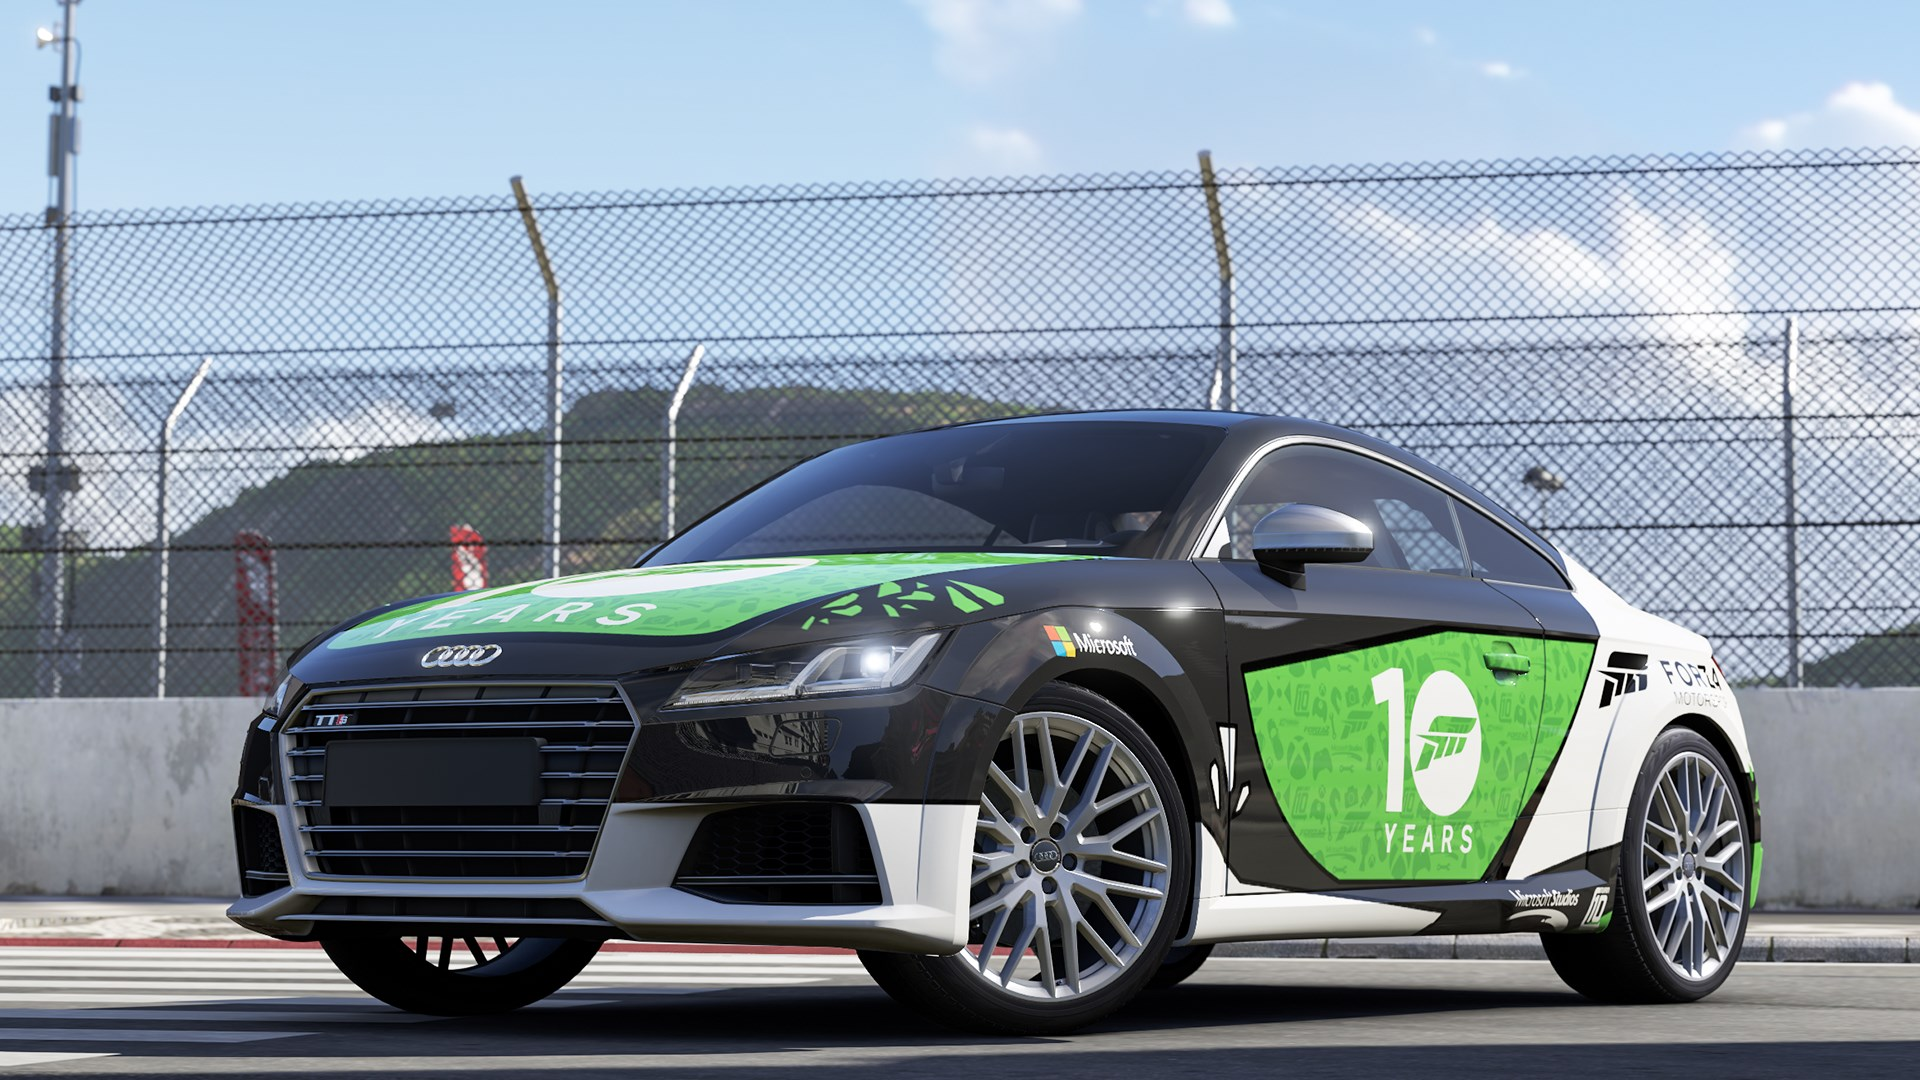 2015 Audi Team Forza TTS Coupé